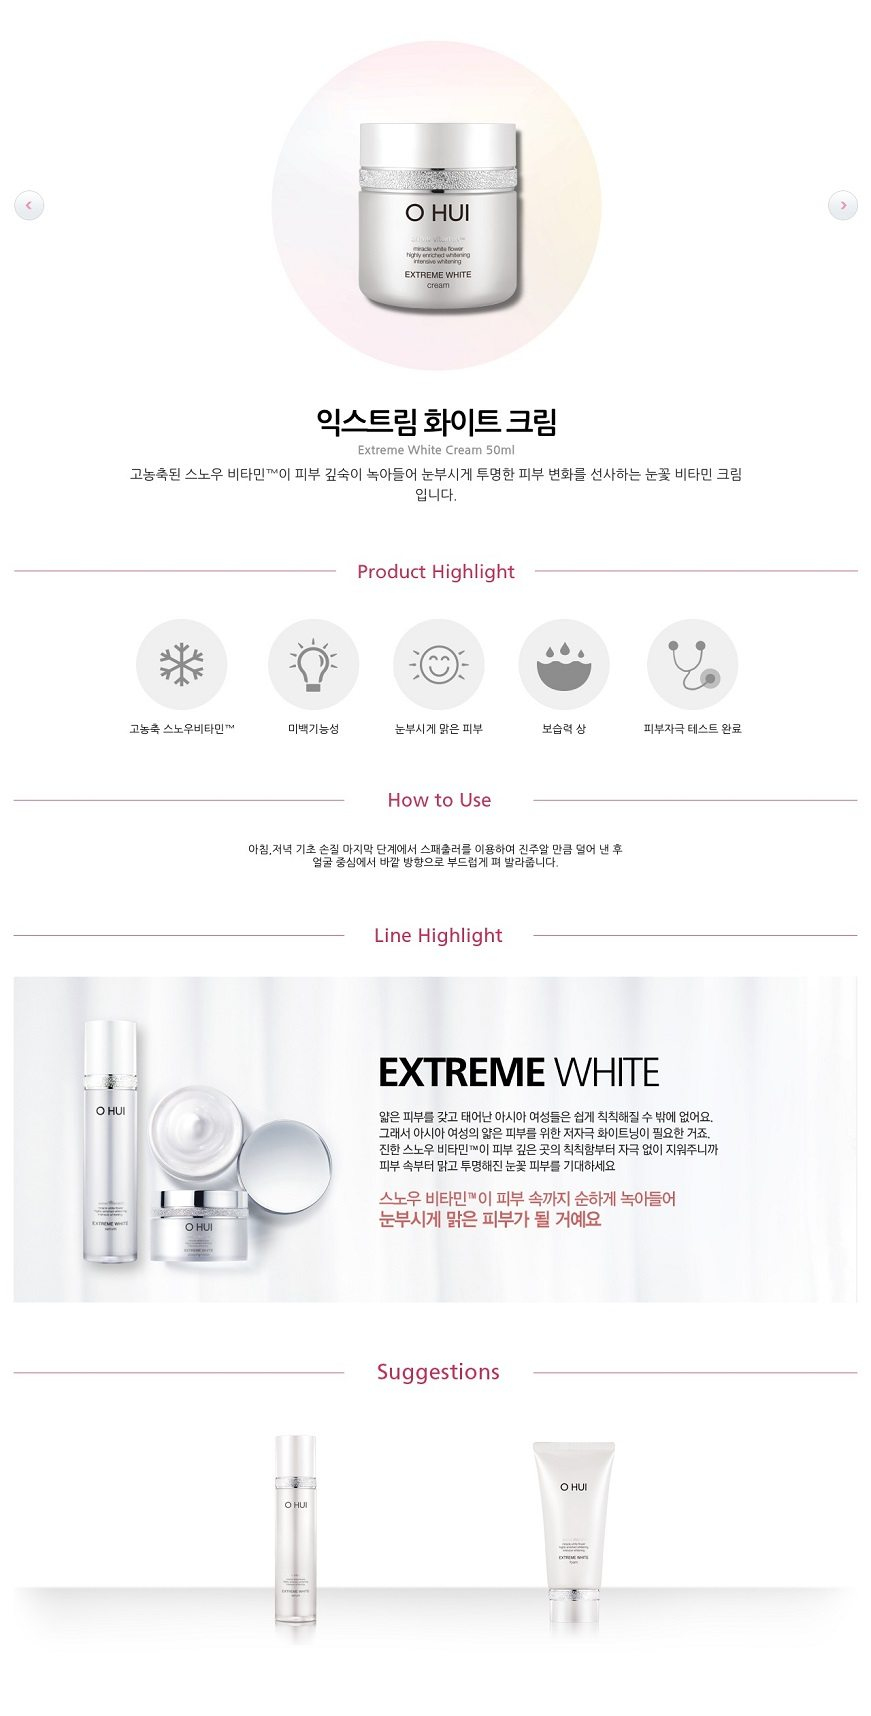 OHUI Extreme White Cream 50ml malaysia singapore indonesia